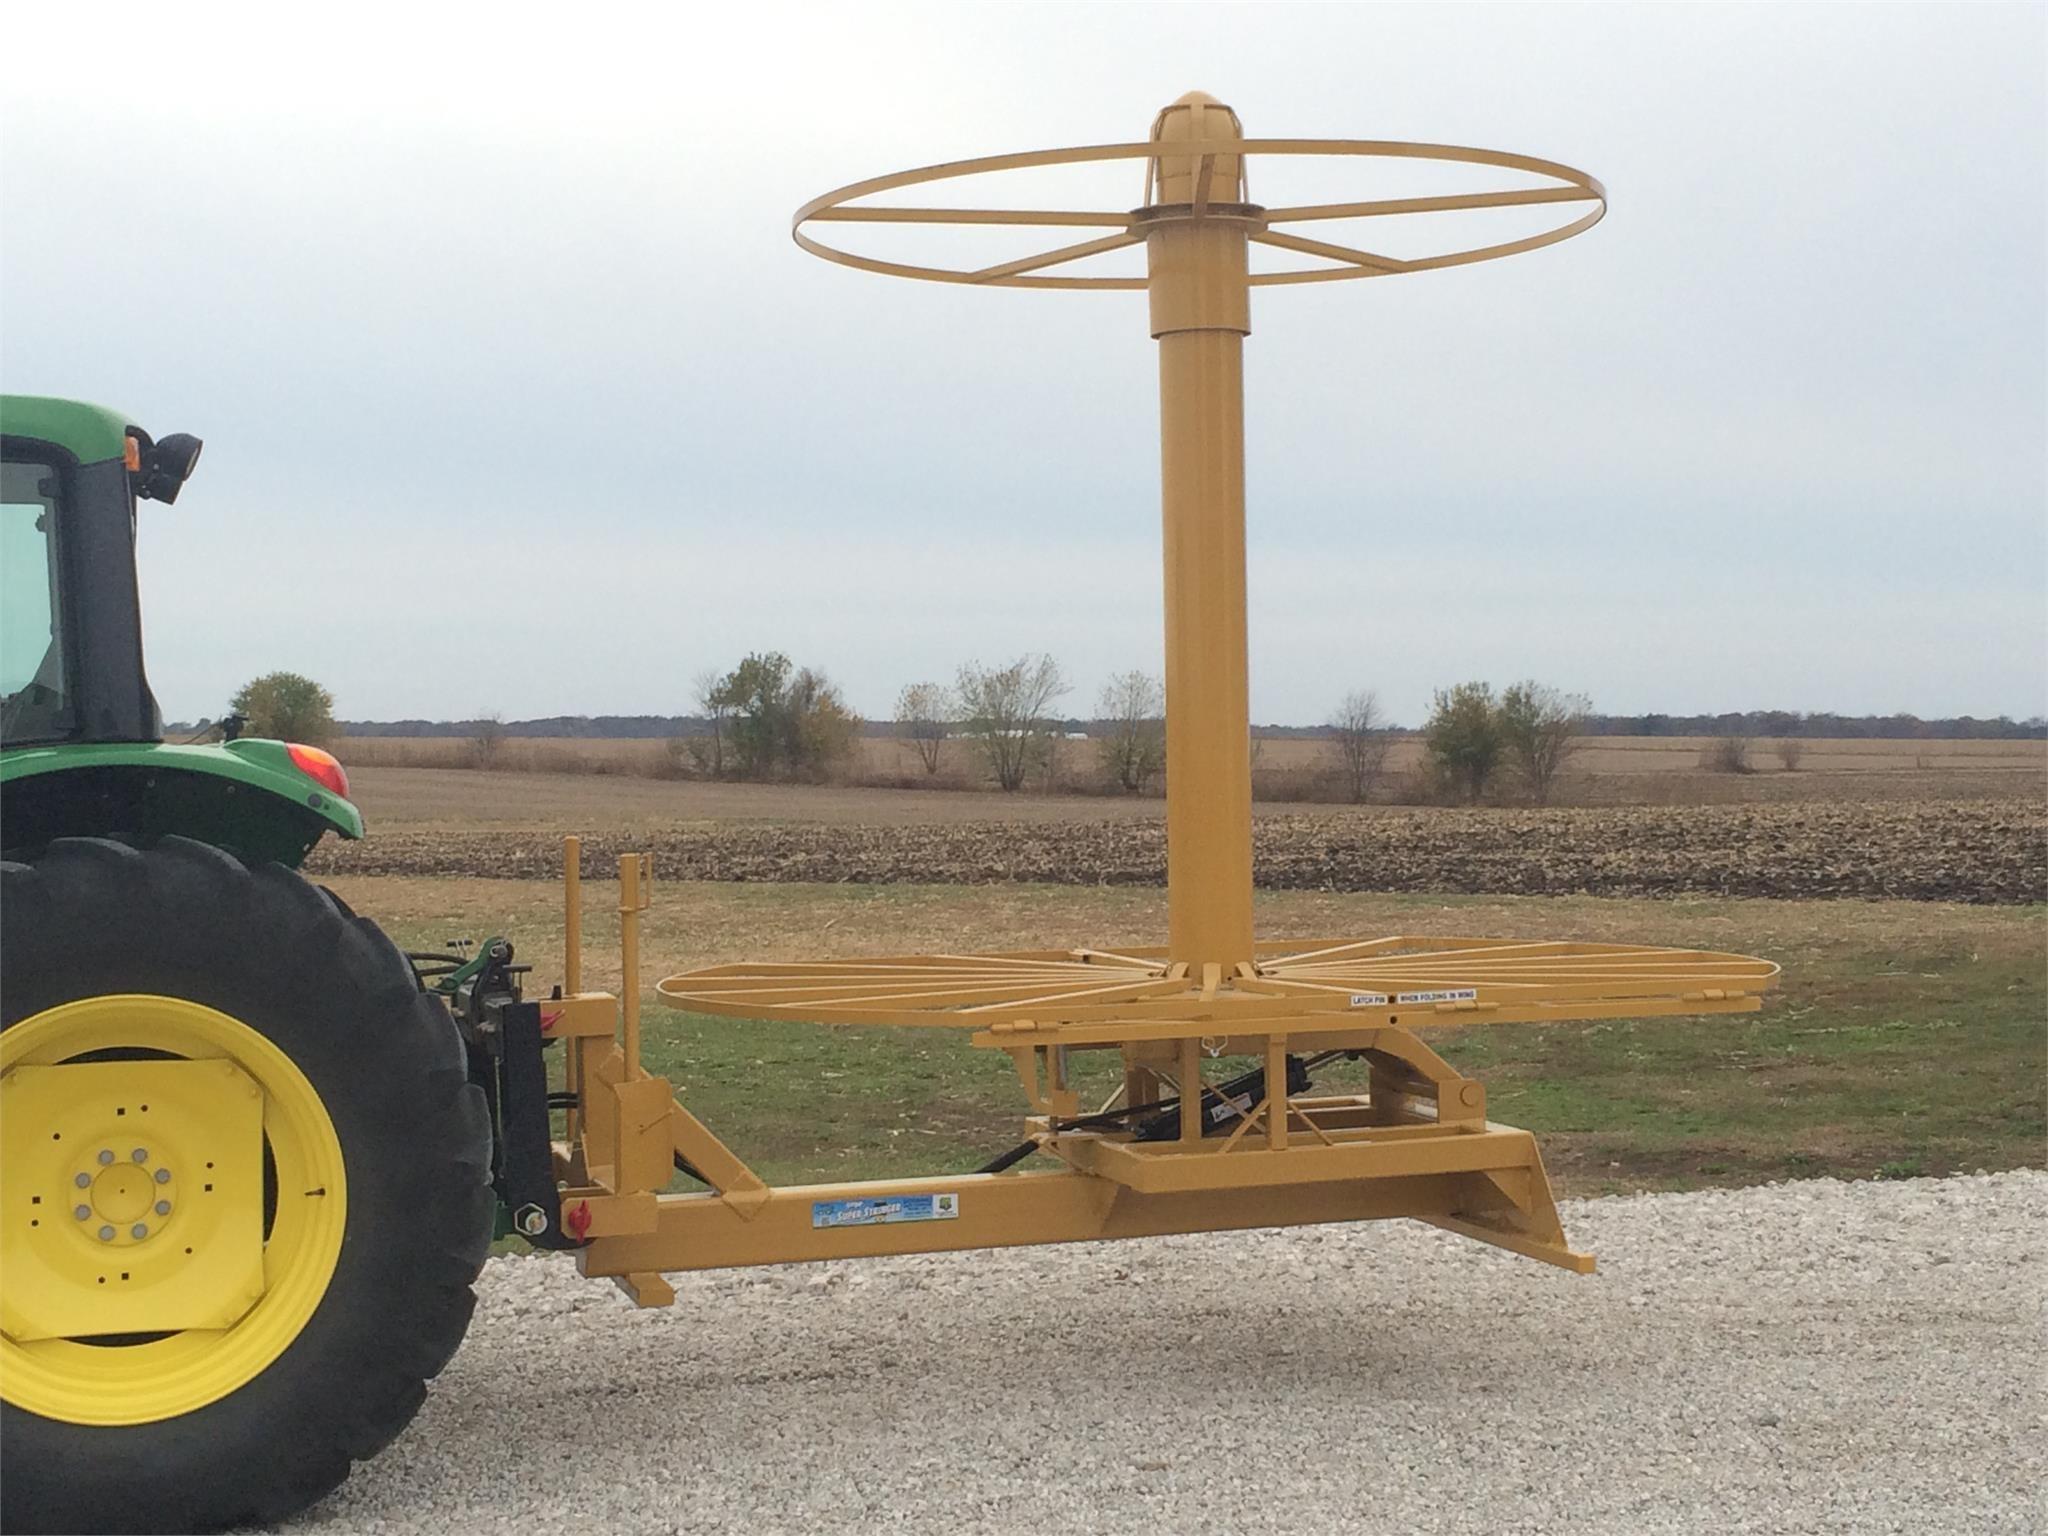 O'CONNELL FARM DRAINAGE PLOWS INC SUPER STRINGER Field Drainage Equipment